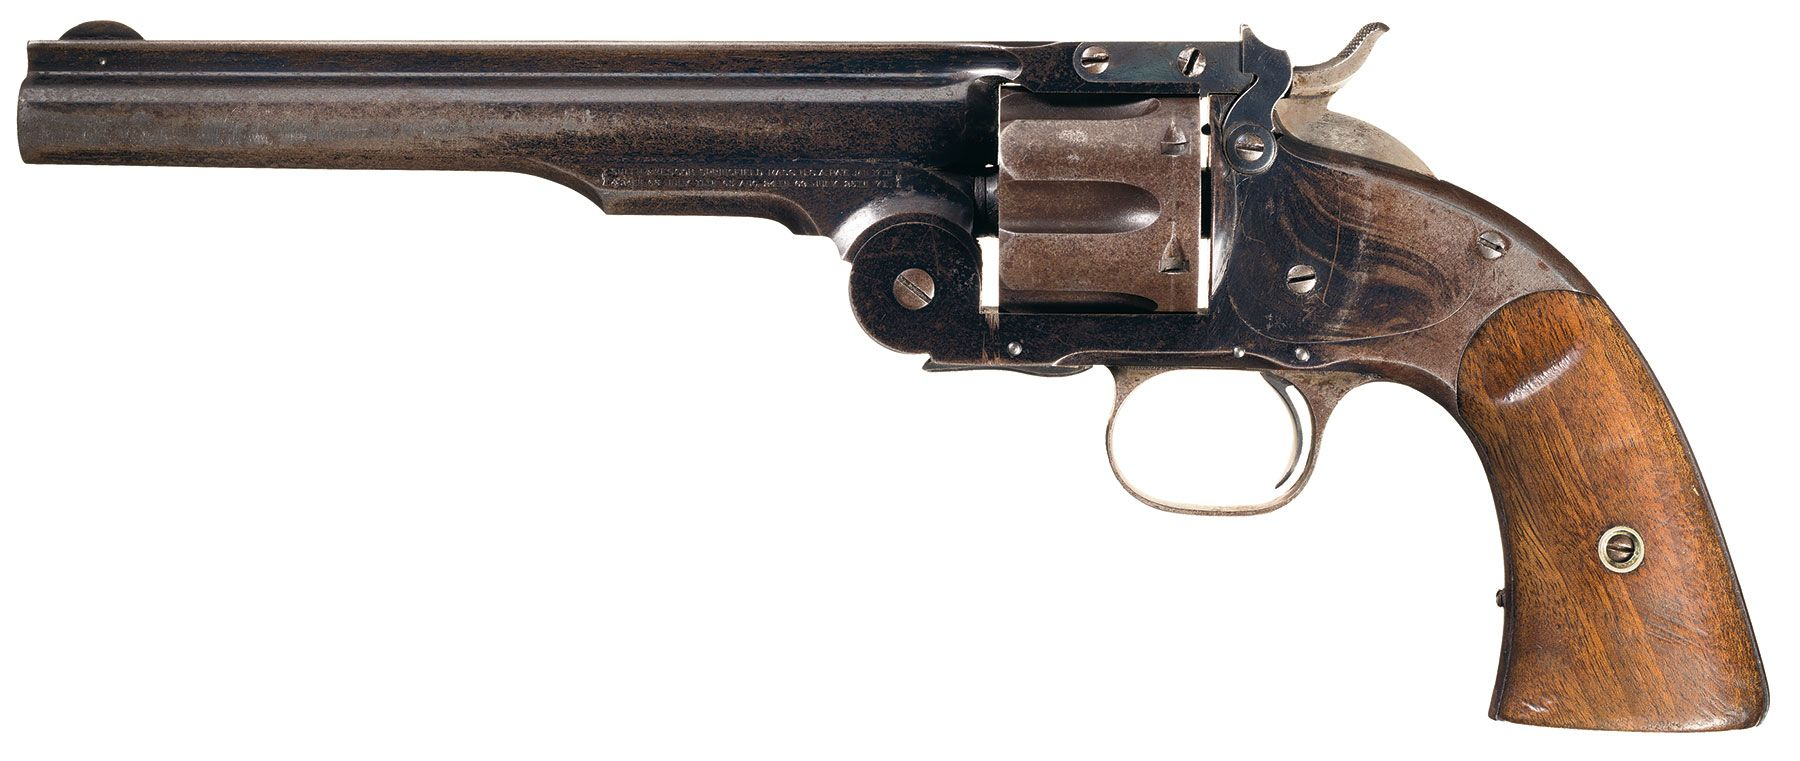 W. J. Jeffery & Co. Steyr Model 1892 Bolt Action Sporting